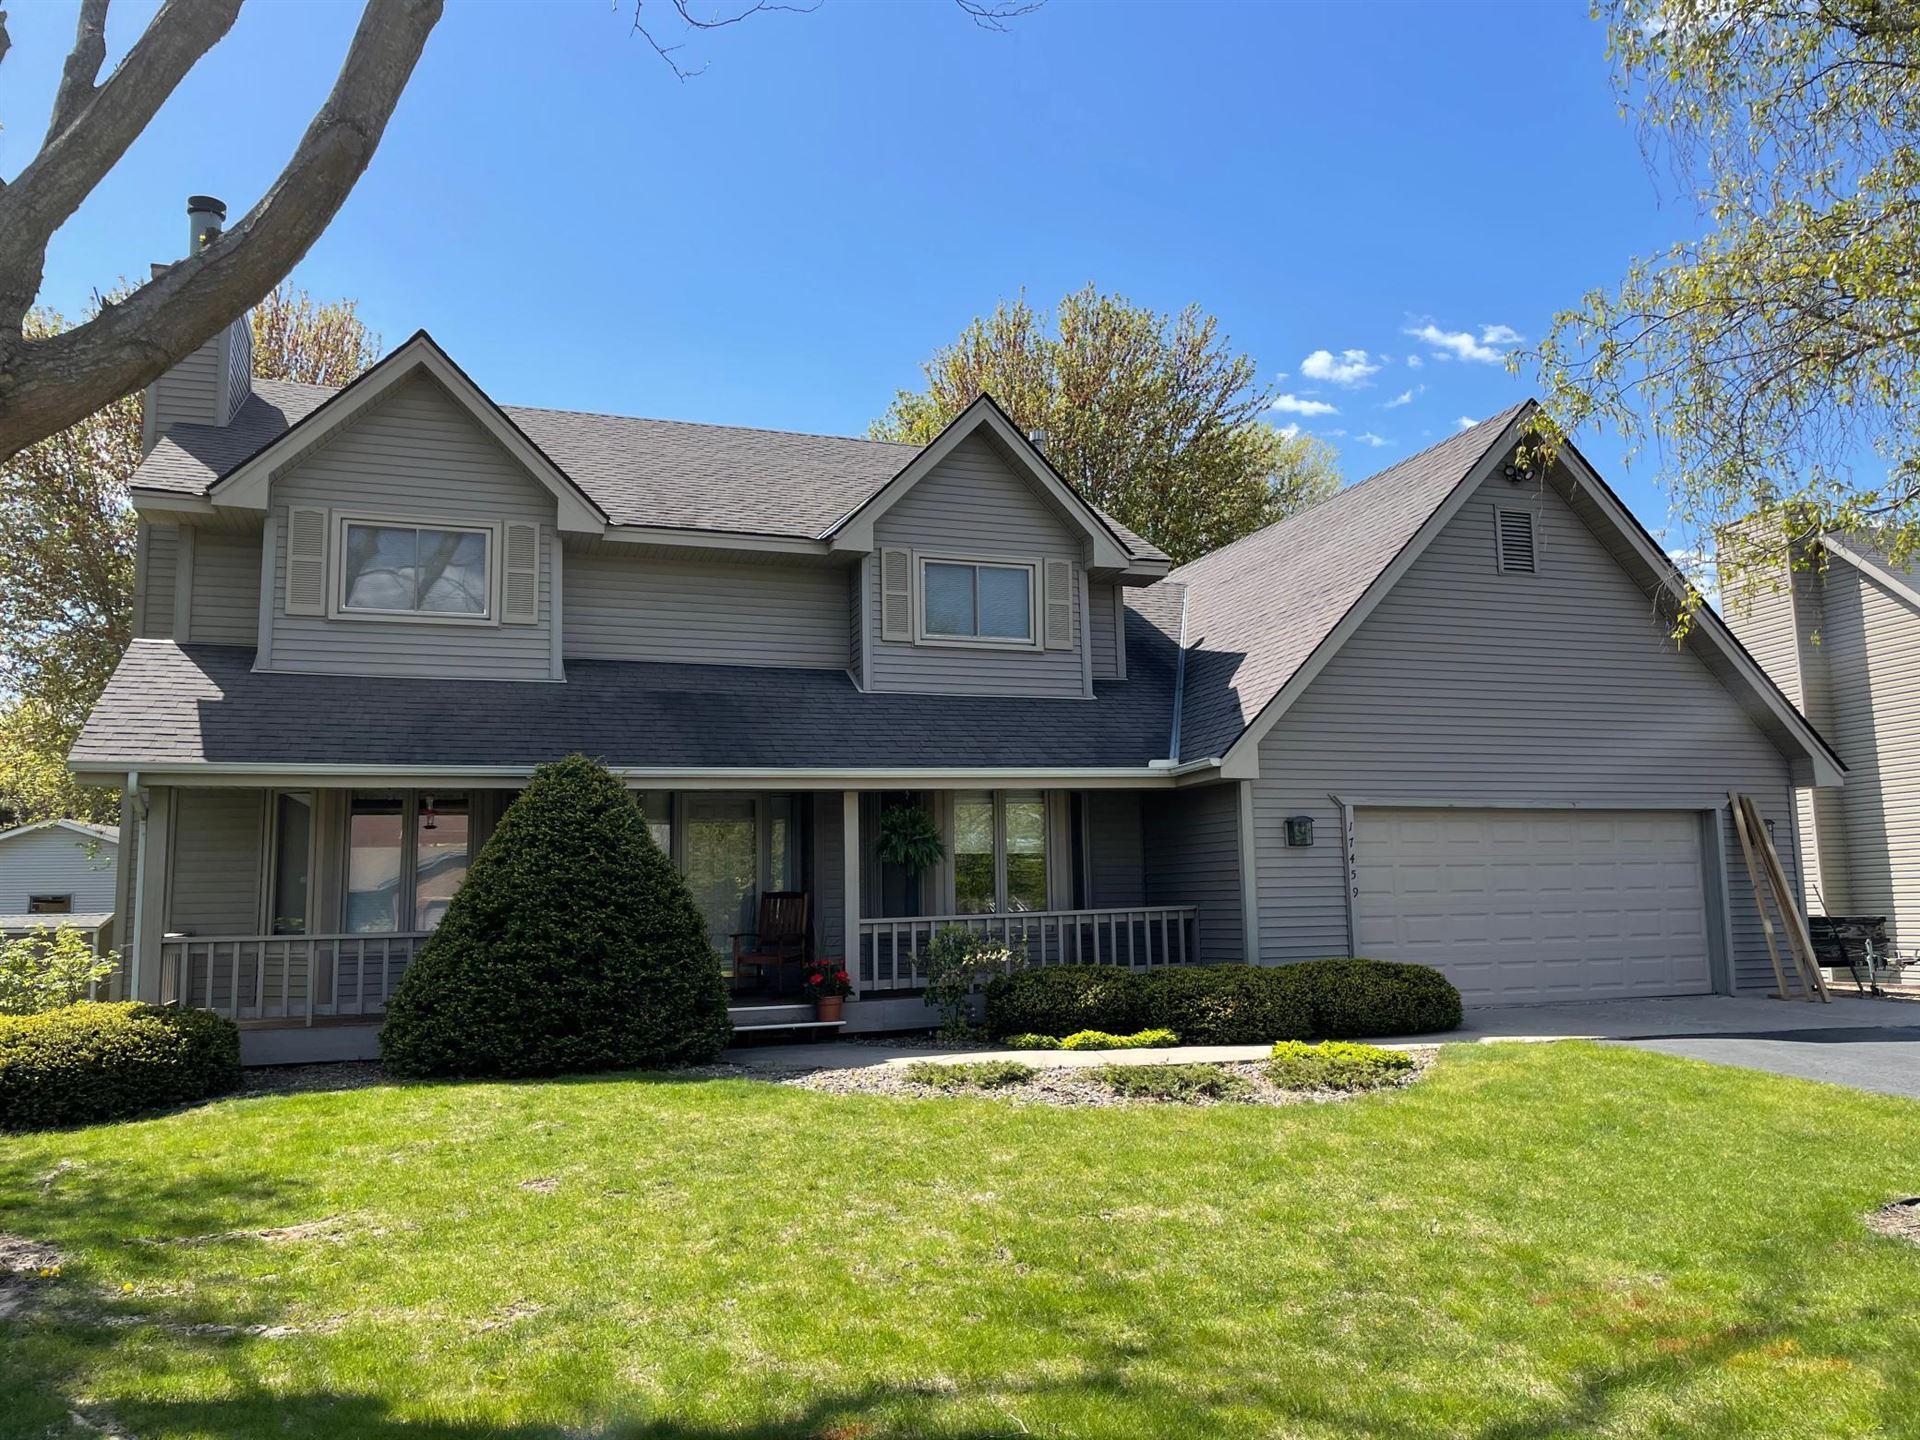 Photo of 17459 Jasmine Avenue, Lakeville, MN 55044 (MLS # 5753621)